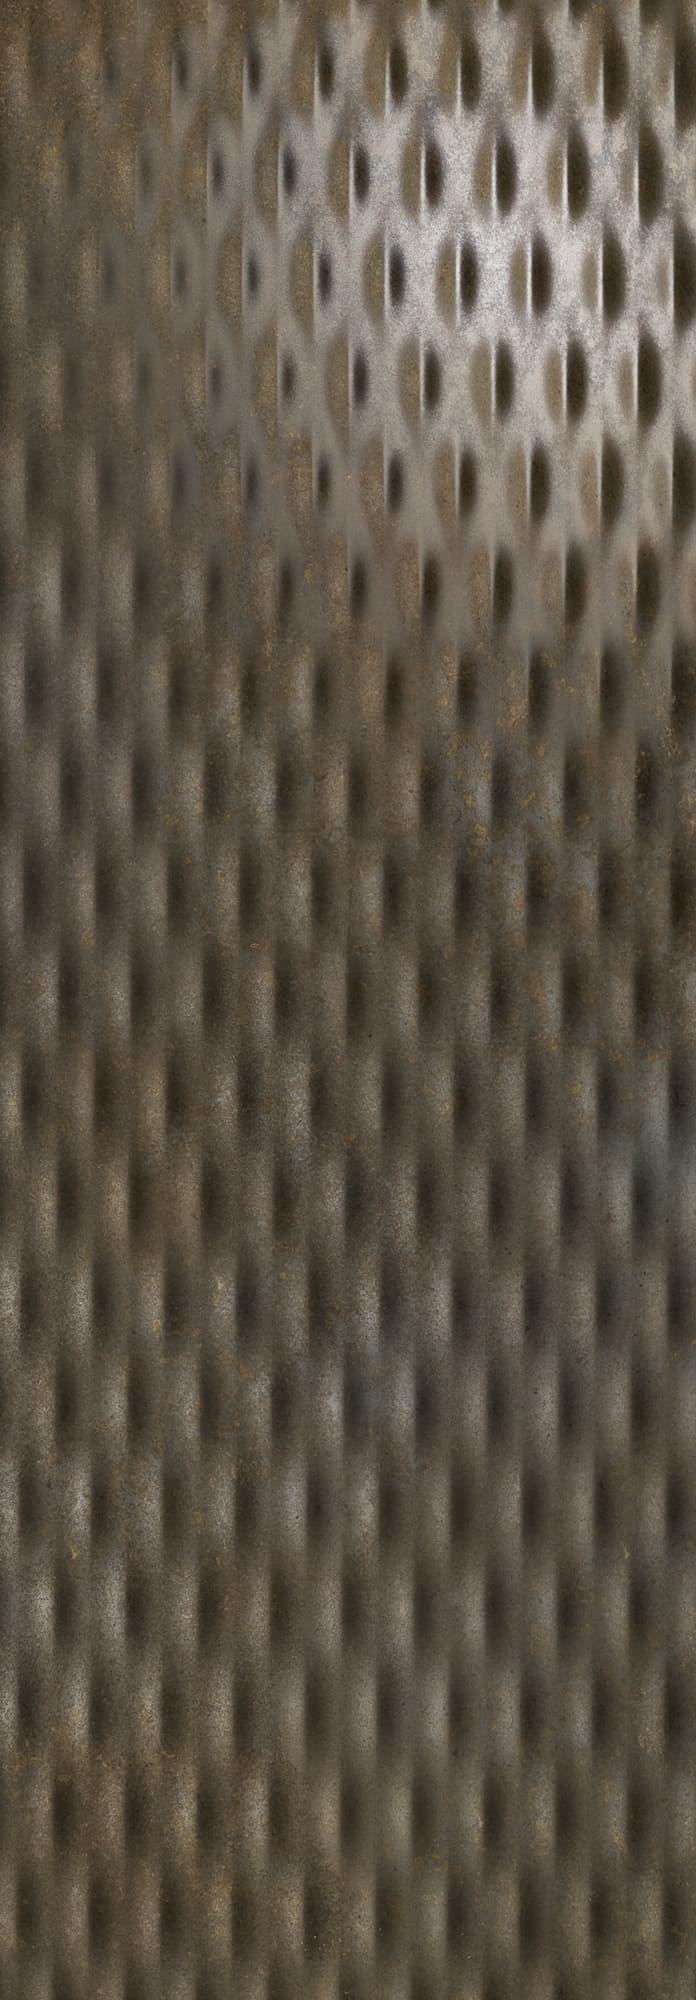 Metallic Grain Carbon